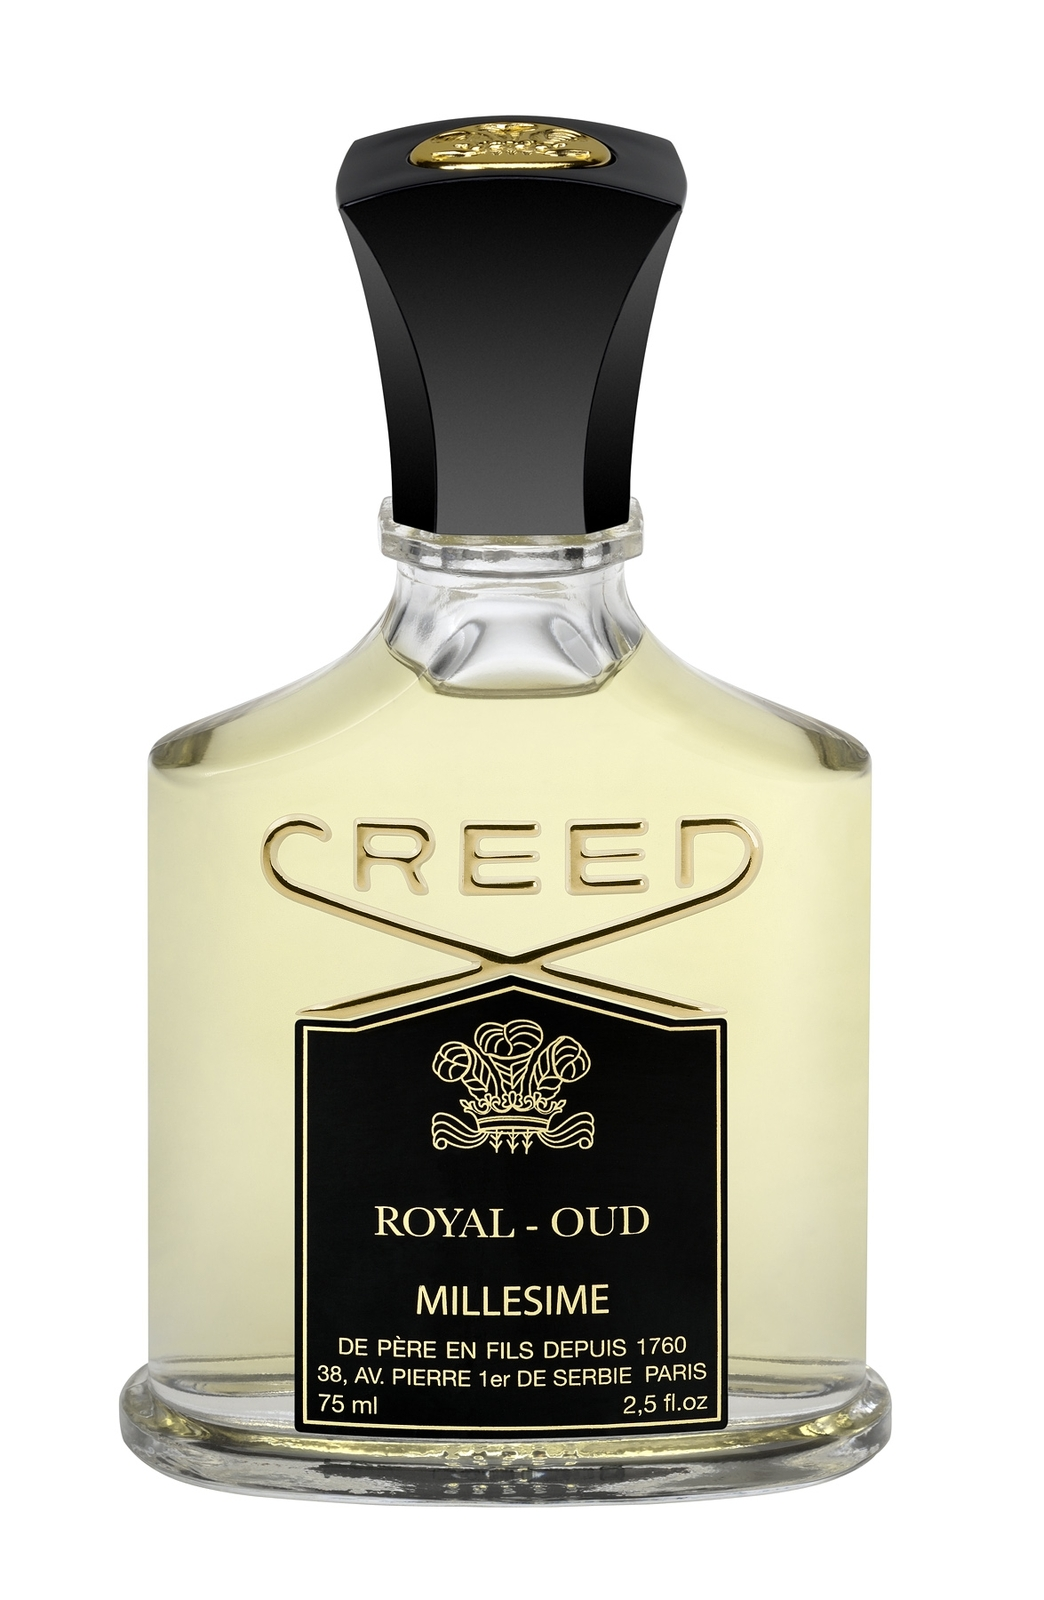 ROYAL OUD by CREED 5ml TRAVEL SPRAY Indian Aoud Galbanum Cedar Musk Perfume